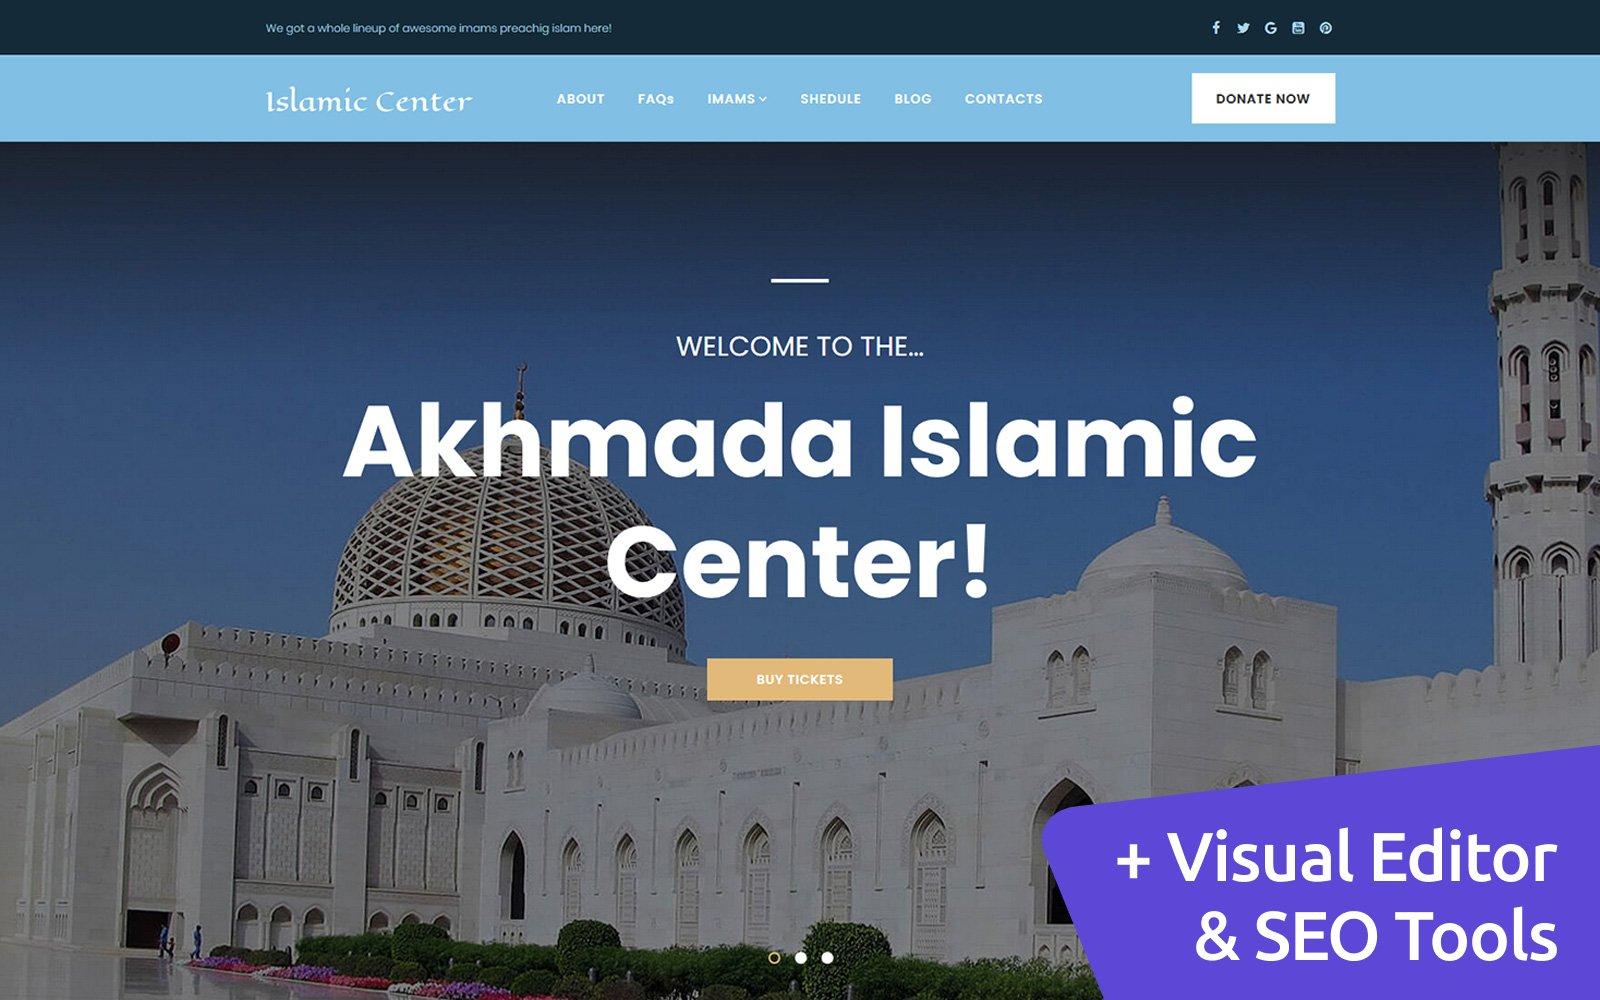 Reszponzív Islamic Center Moto CMS 3 sablon 116433